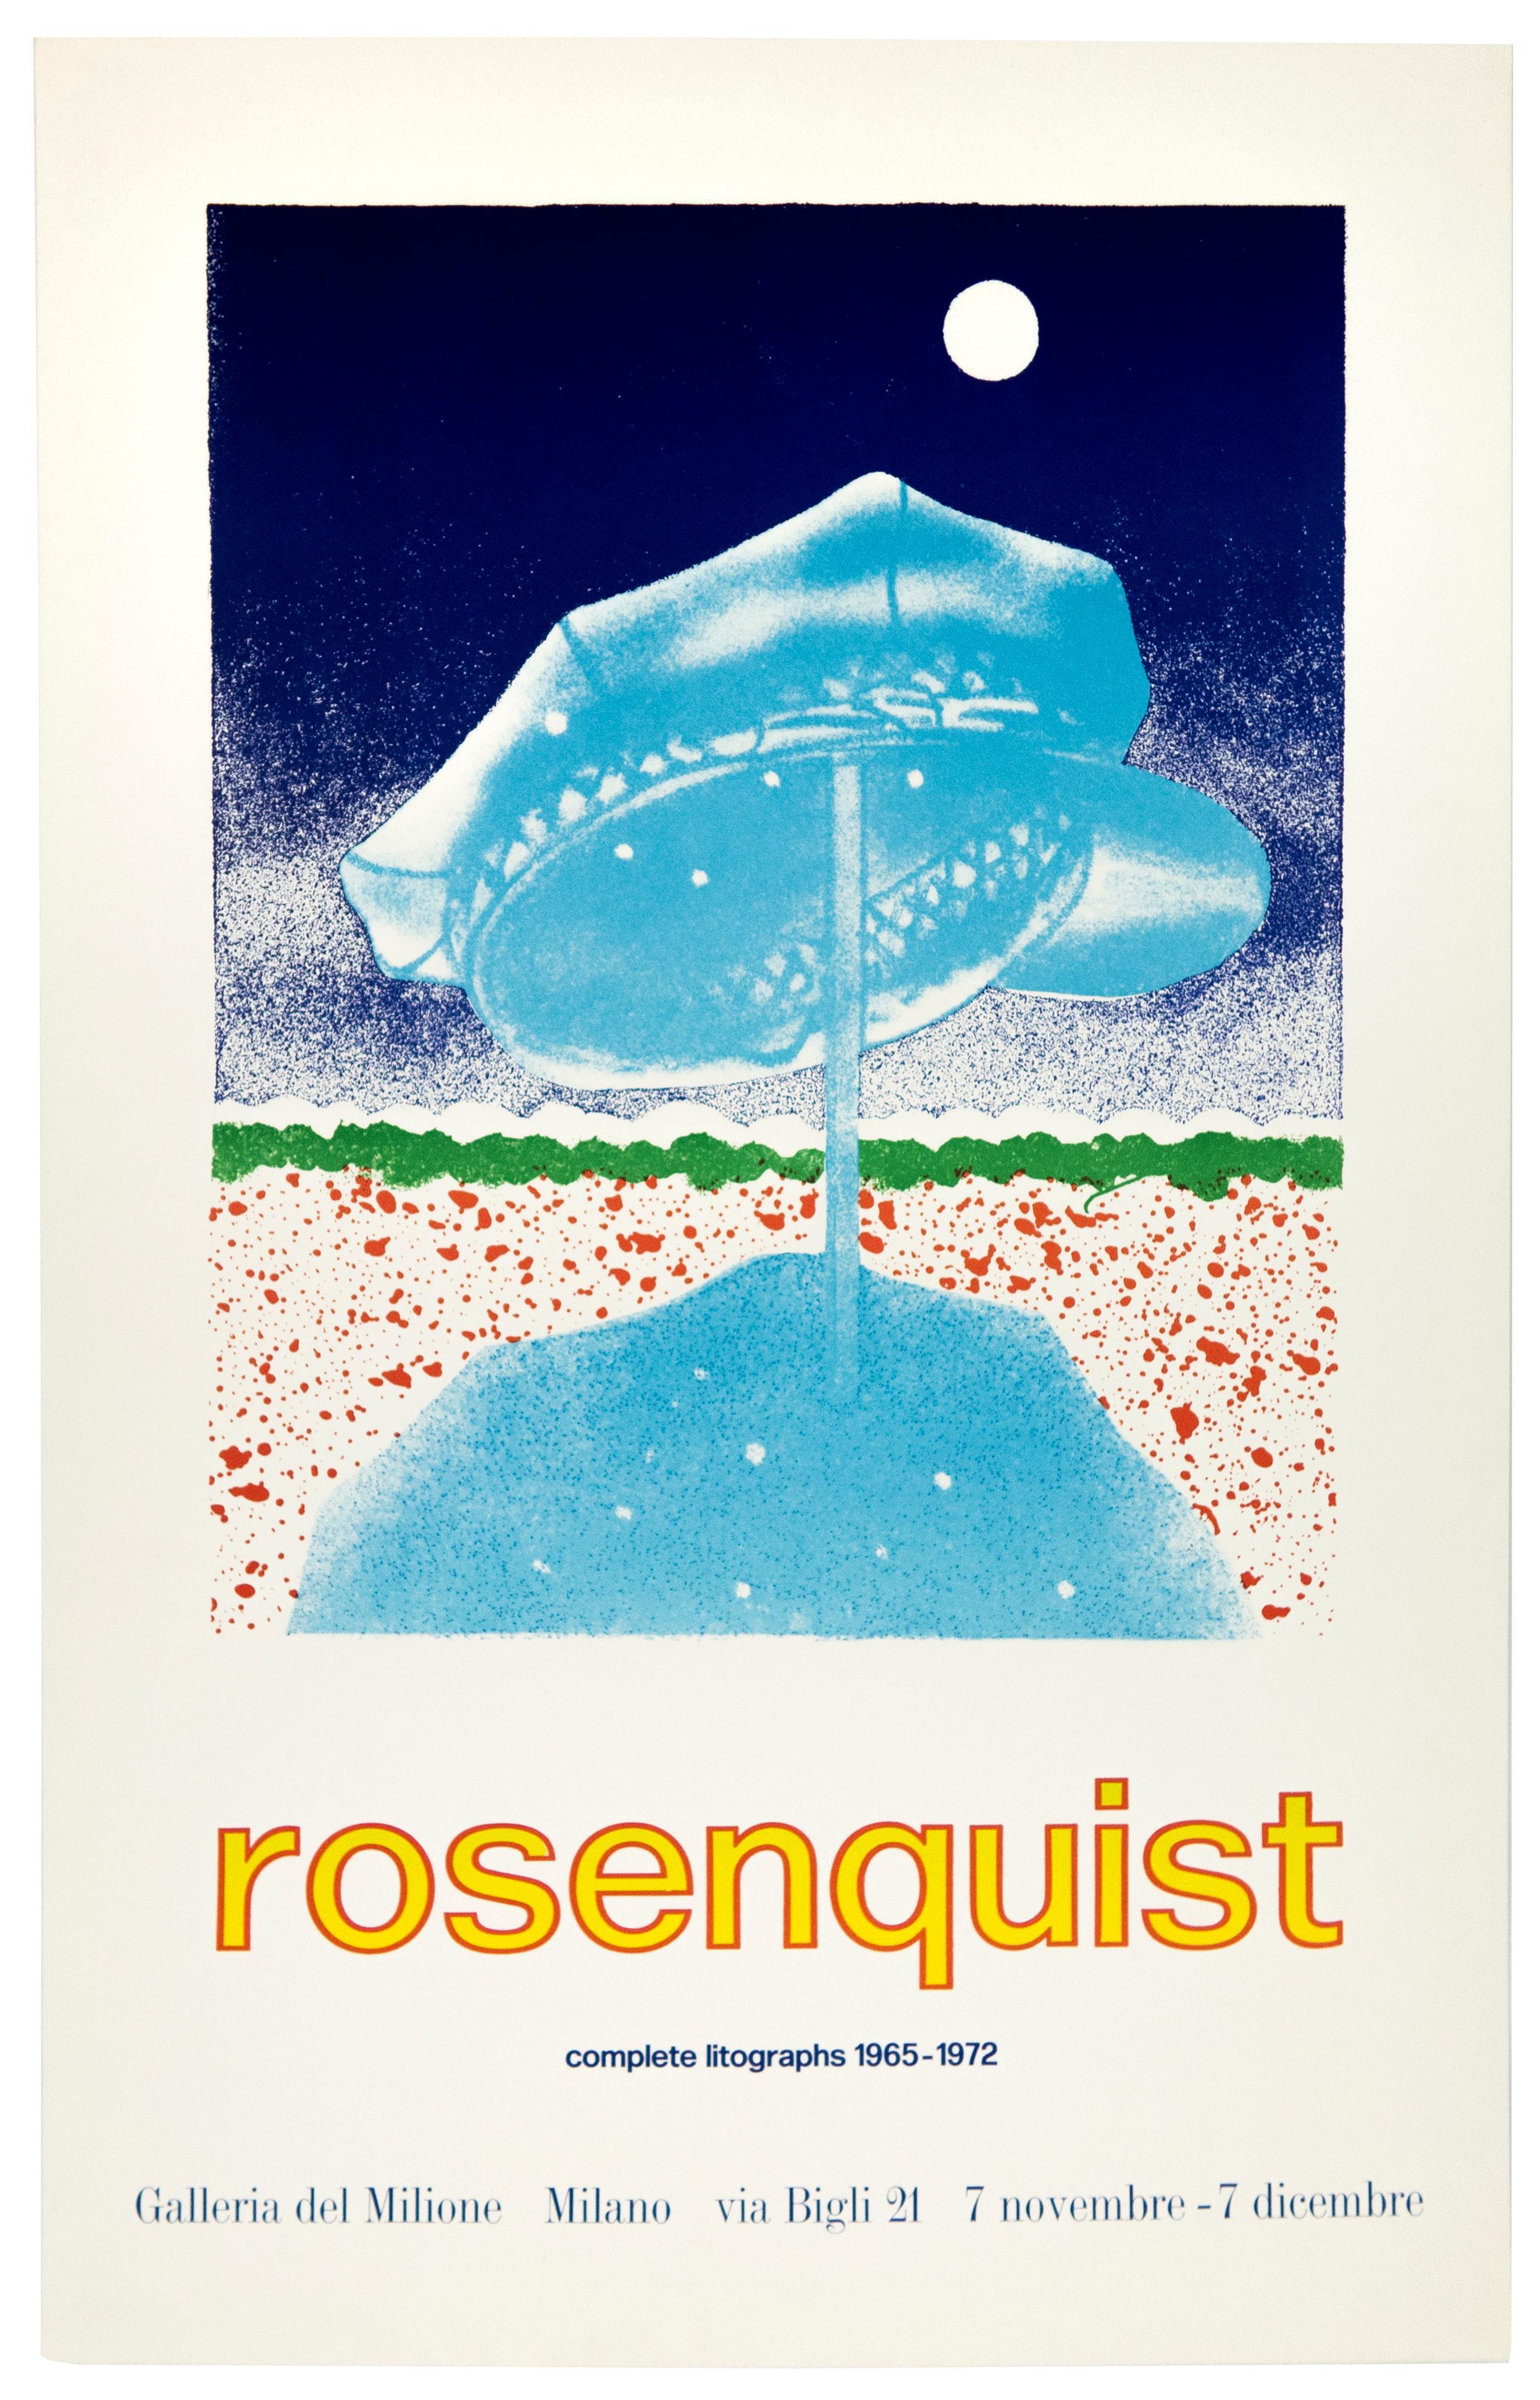 James Rosenquist Vintage Poster: Galleria del Milione 1972 full moon landscape